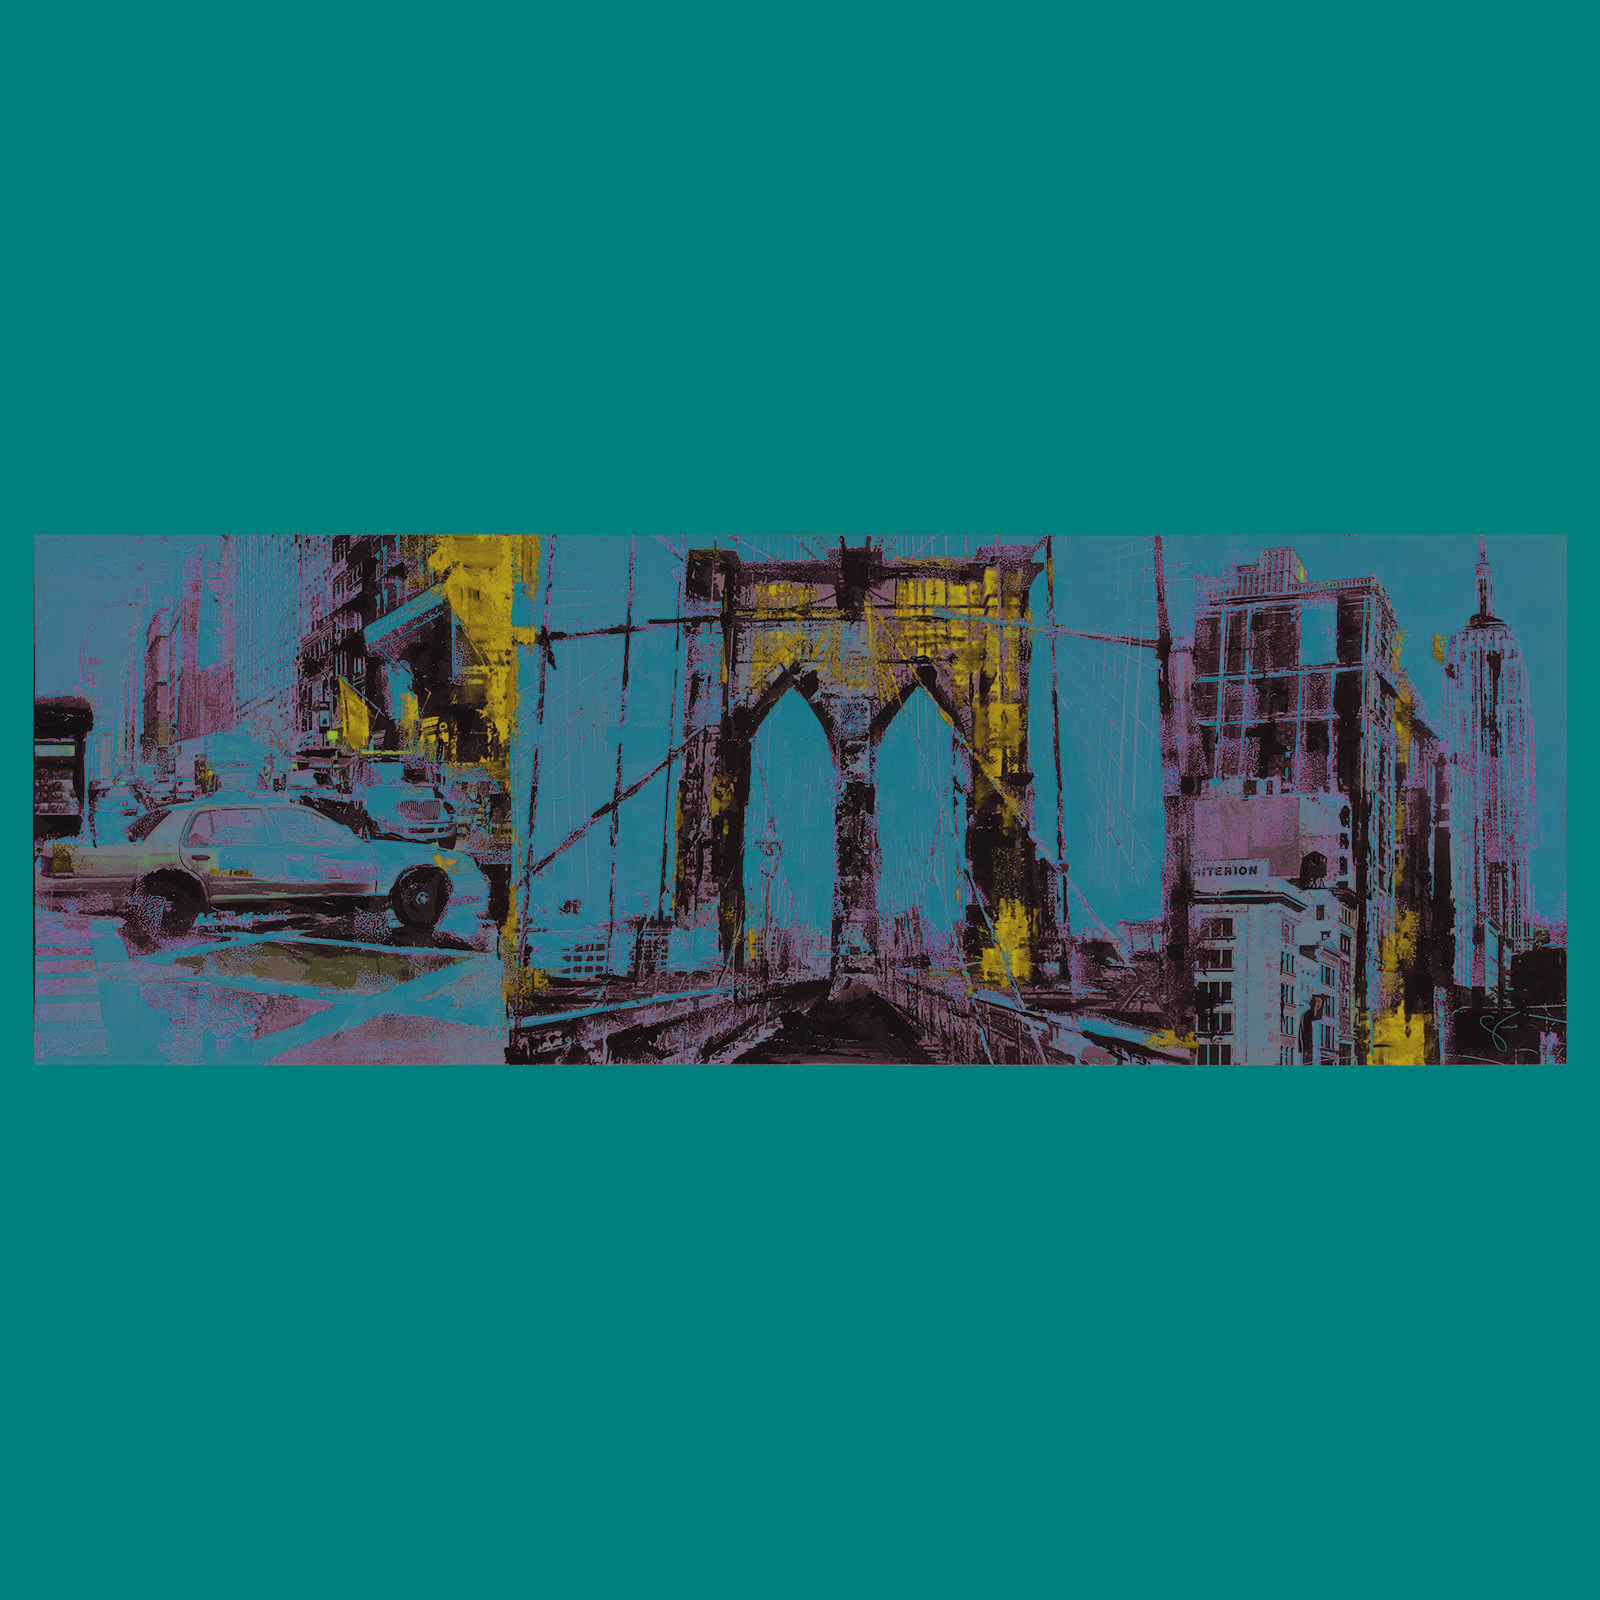 Urban London Rectangular Painting OL918